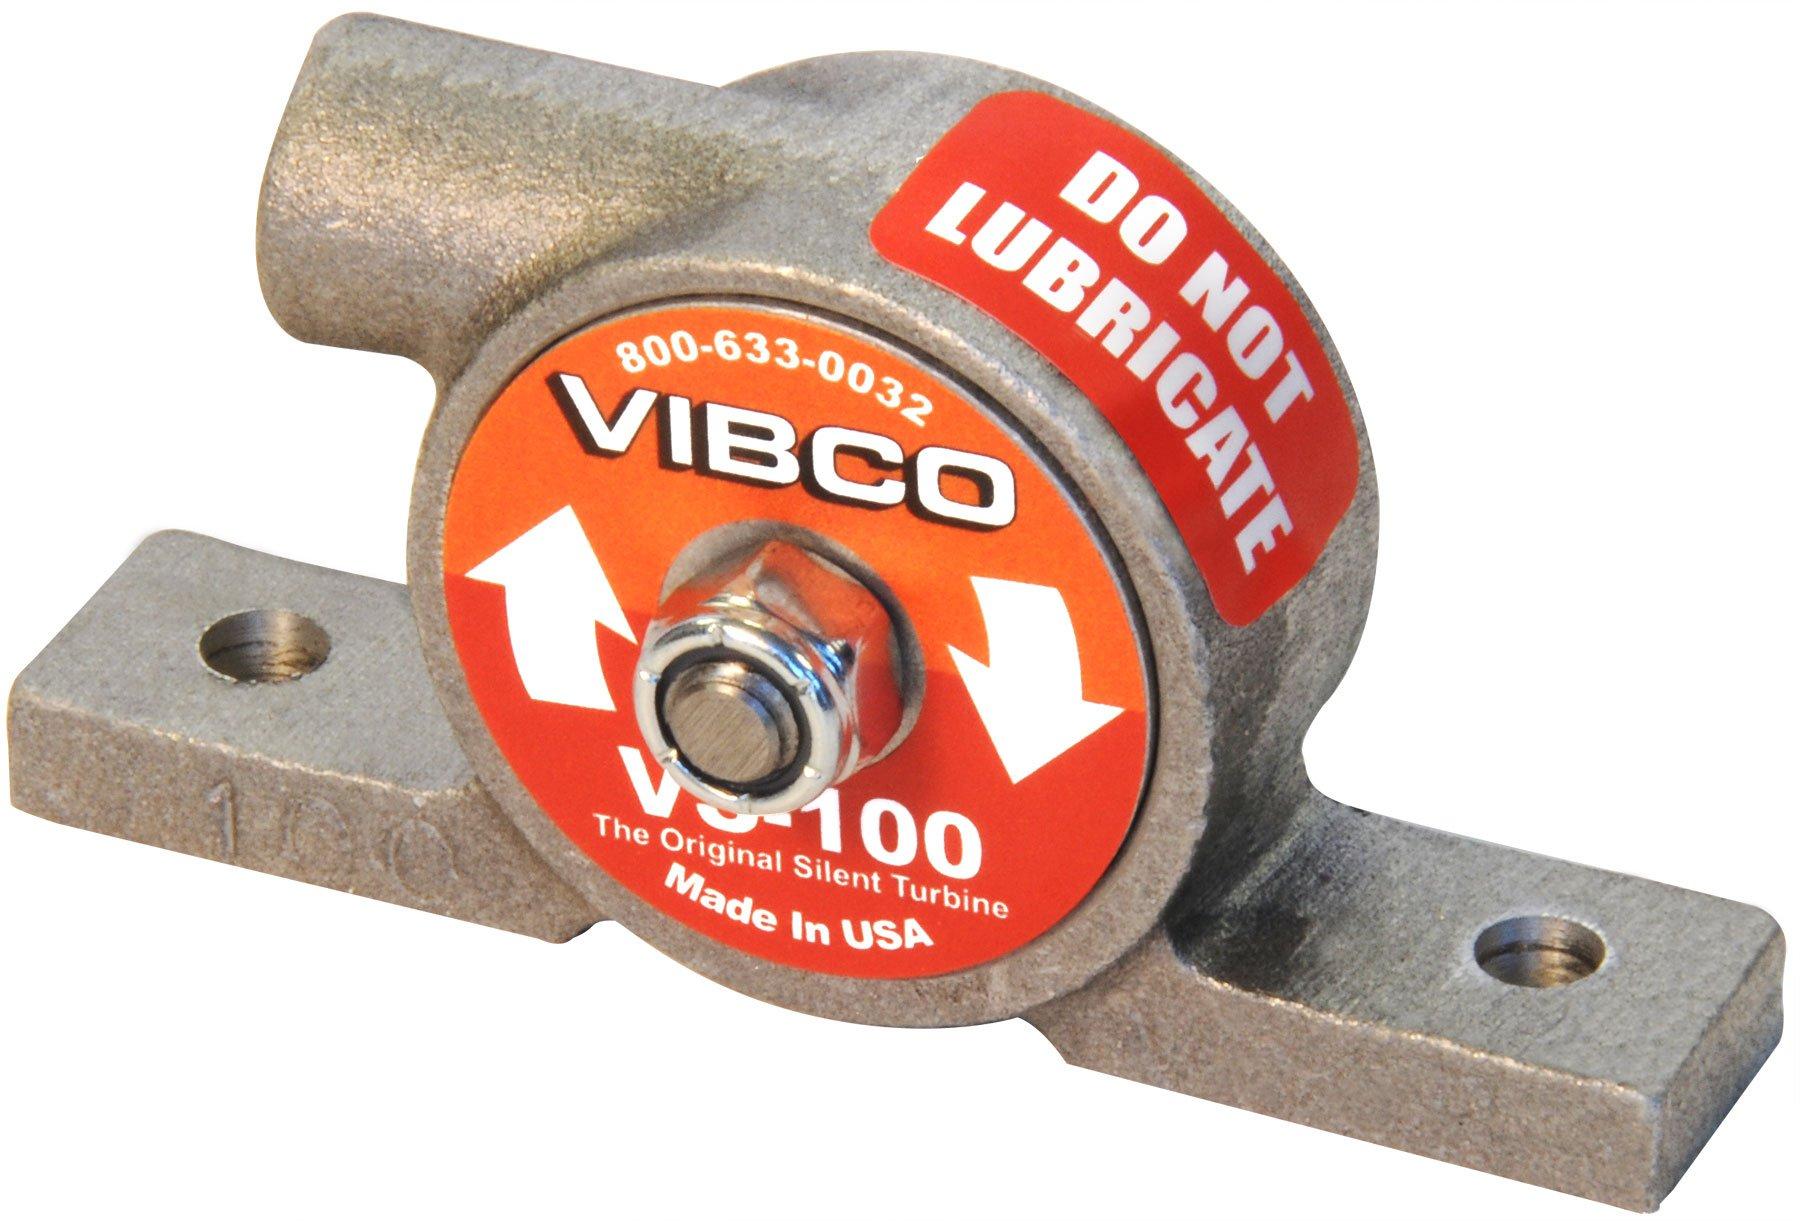 Pneumatic Vibrator, 20 Lb, 12, 000Vpm, 60Psi by Vibco